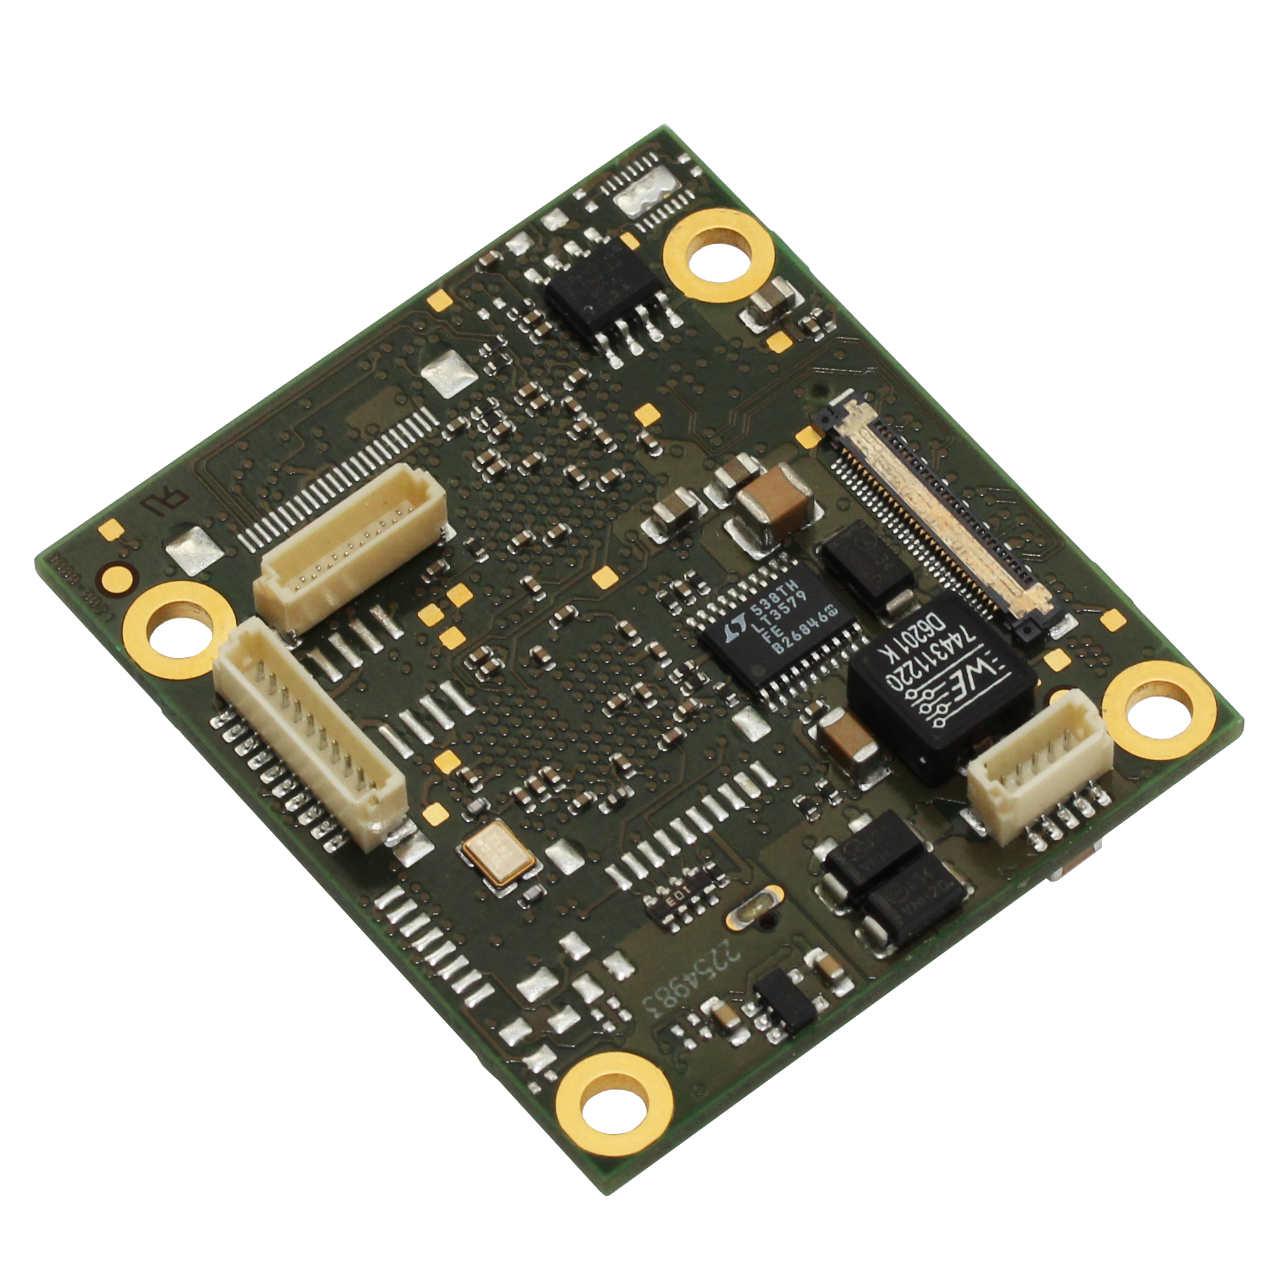 TL6035 |USB 3.0, Vertical Micro B Connector